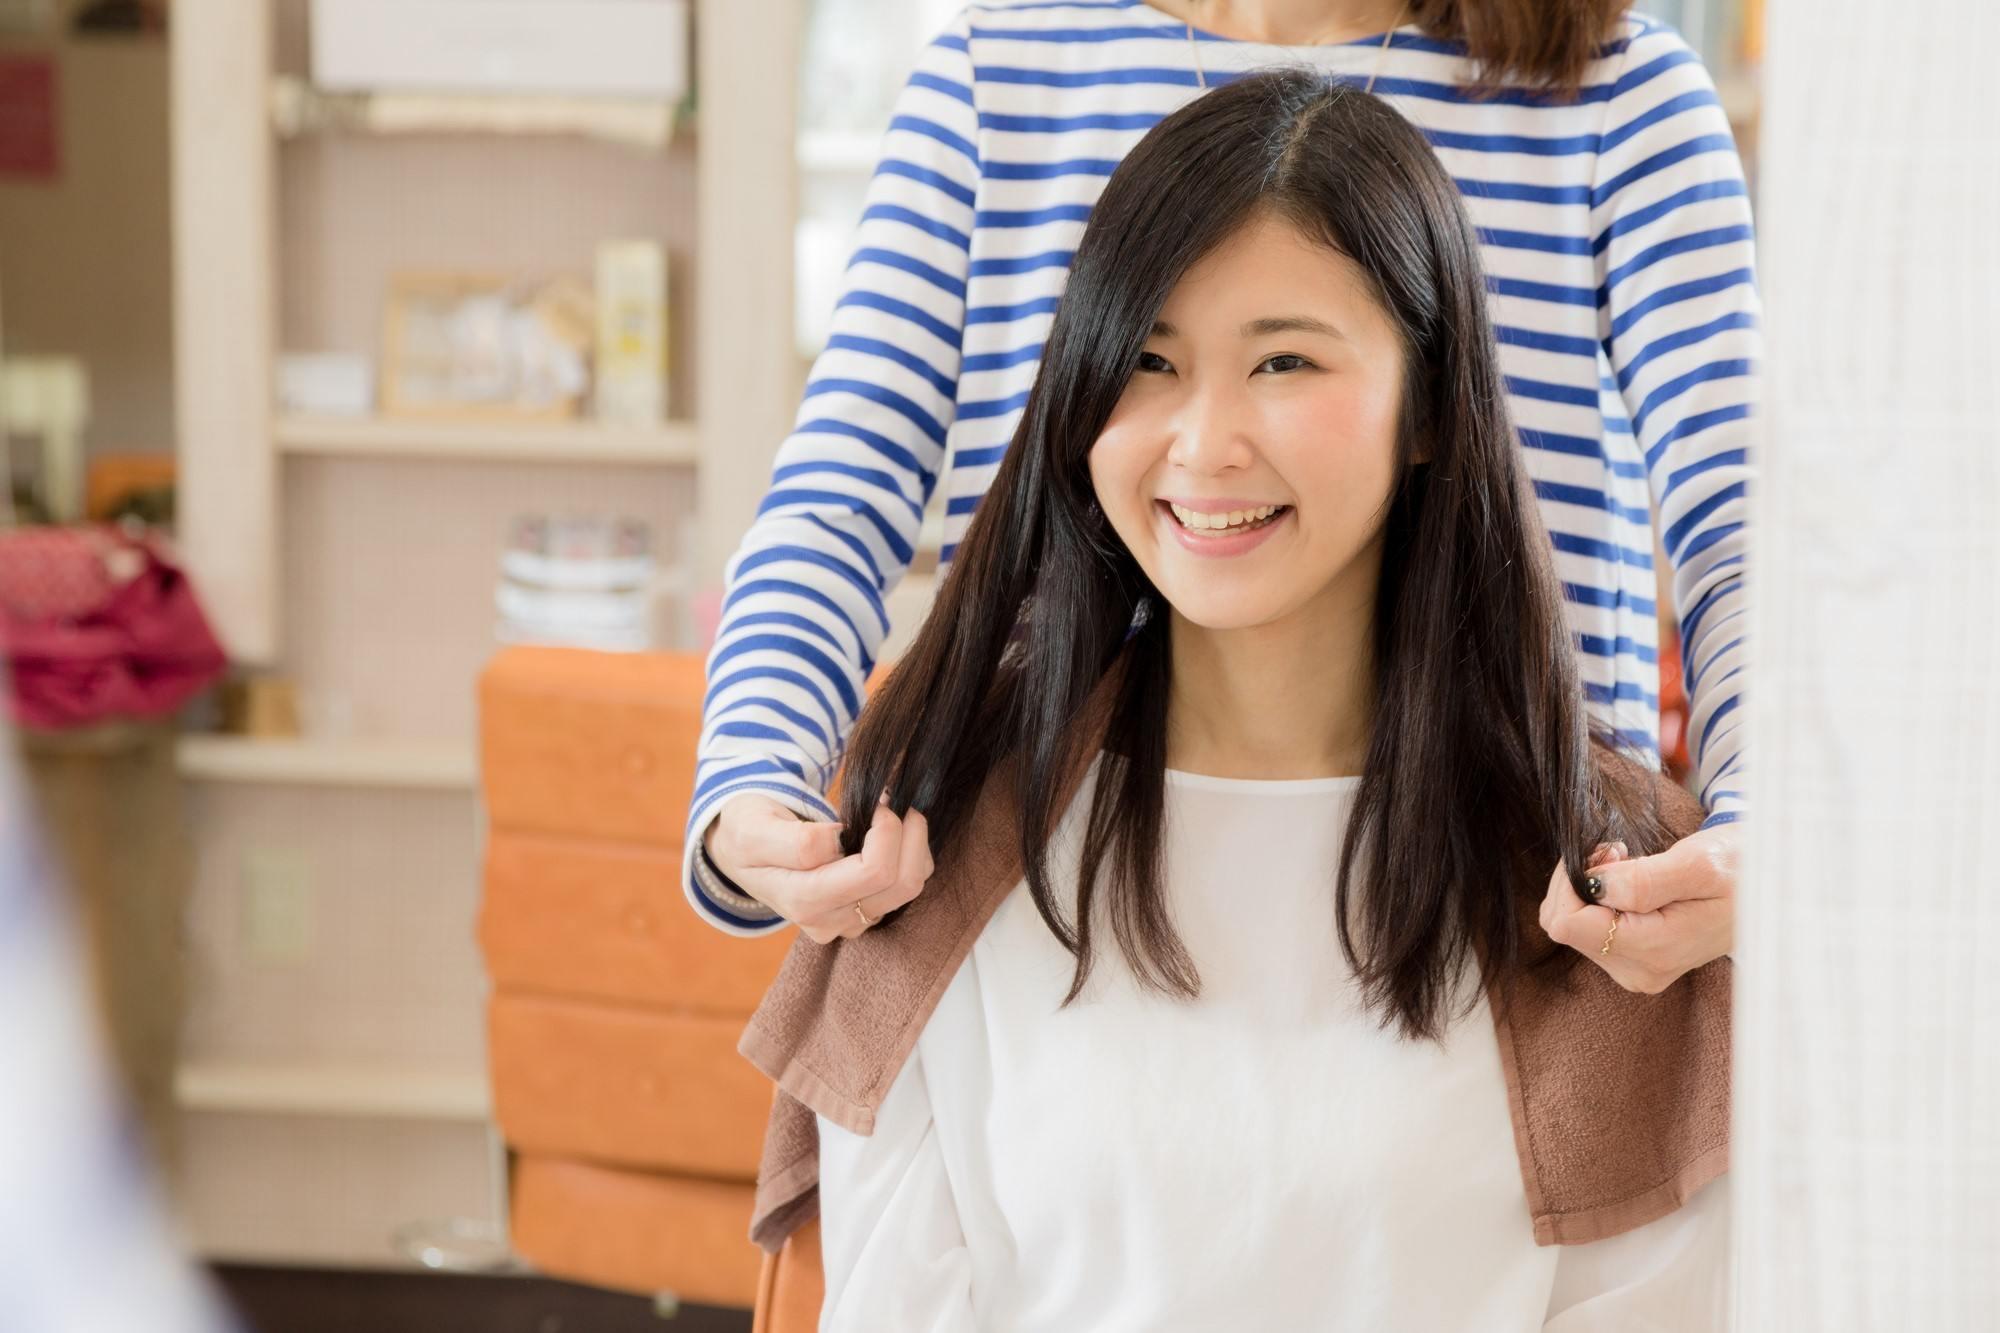 Perawatan rambut dengan shampoo dan conditioner adalah yang utama.